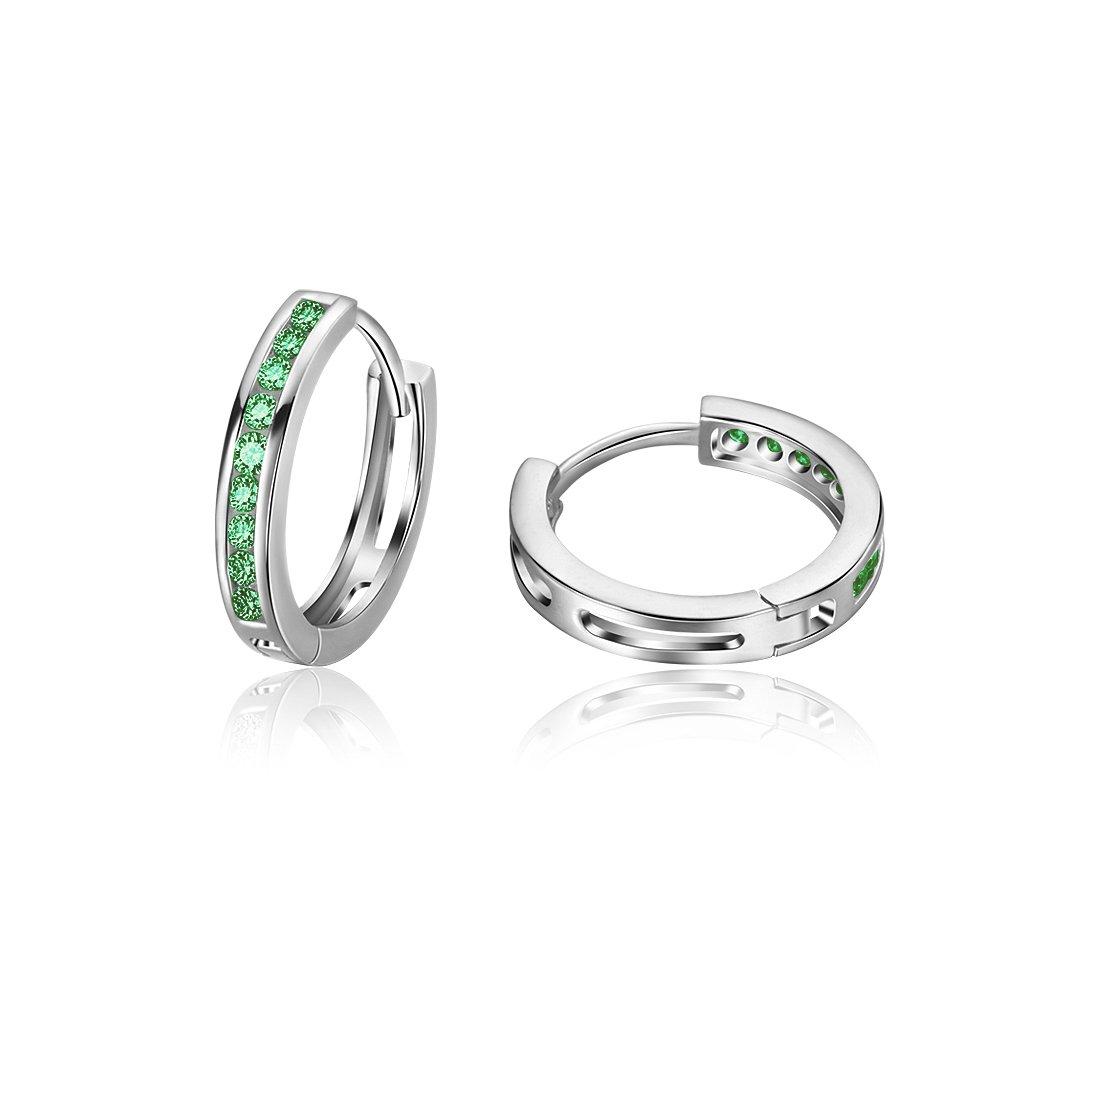 Carleen 925 Sterling Silver Channel Set Round Cut 9-stone Green Cubic Zirconia CZ Hinged Hoop Earrings for Women Girls Diameter 1.8cm